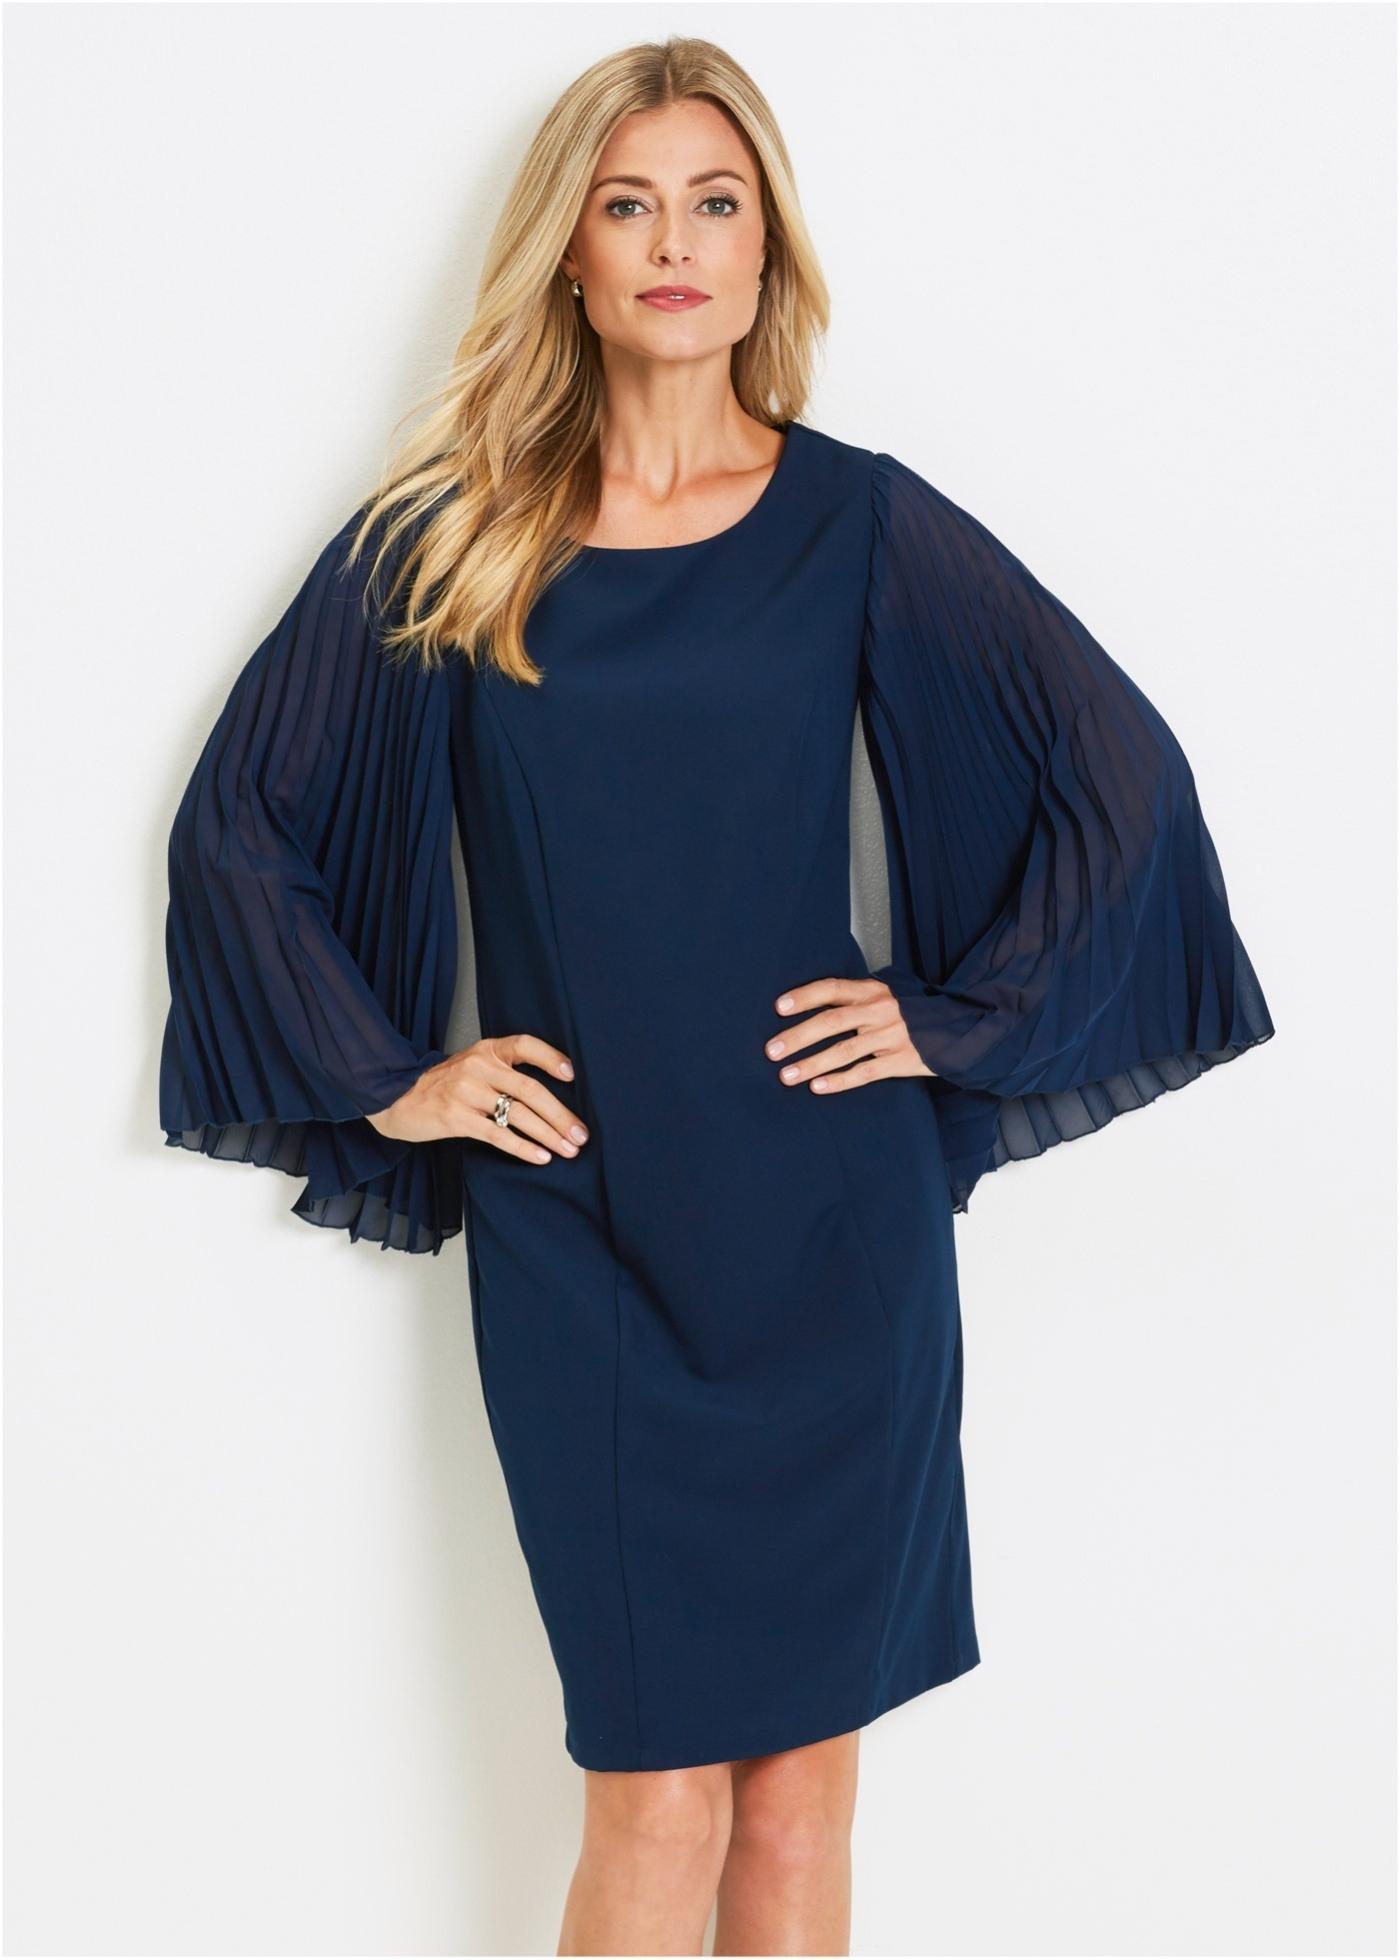 13 Elegant Kleid Dunkelblau Langarm Bester Preis20 Schön Kleid Dunkelblau Langarm für 2019